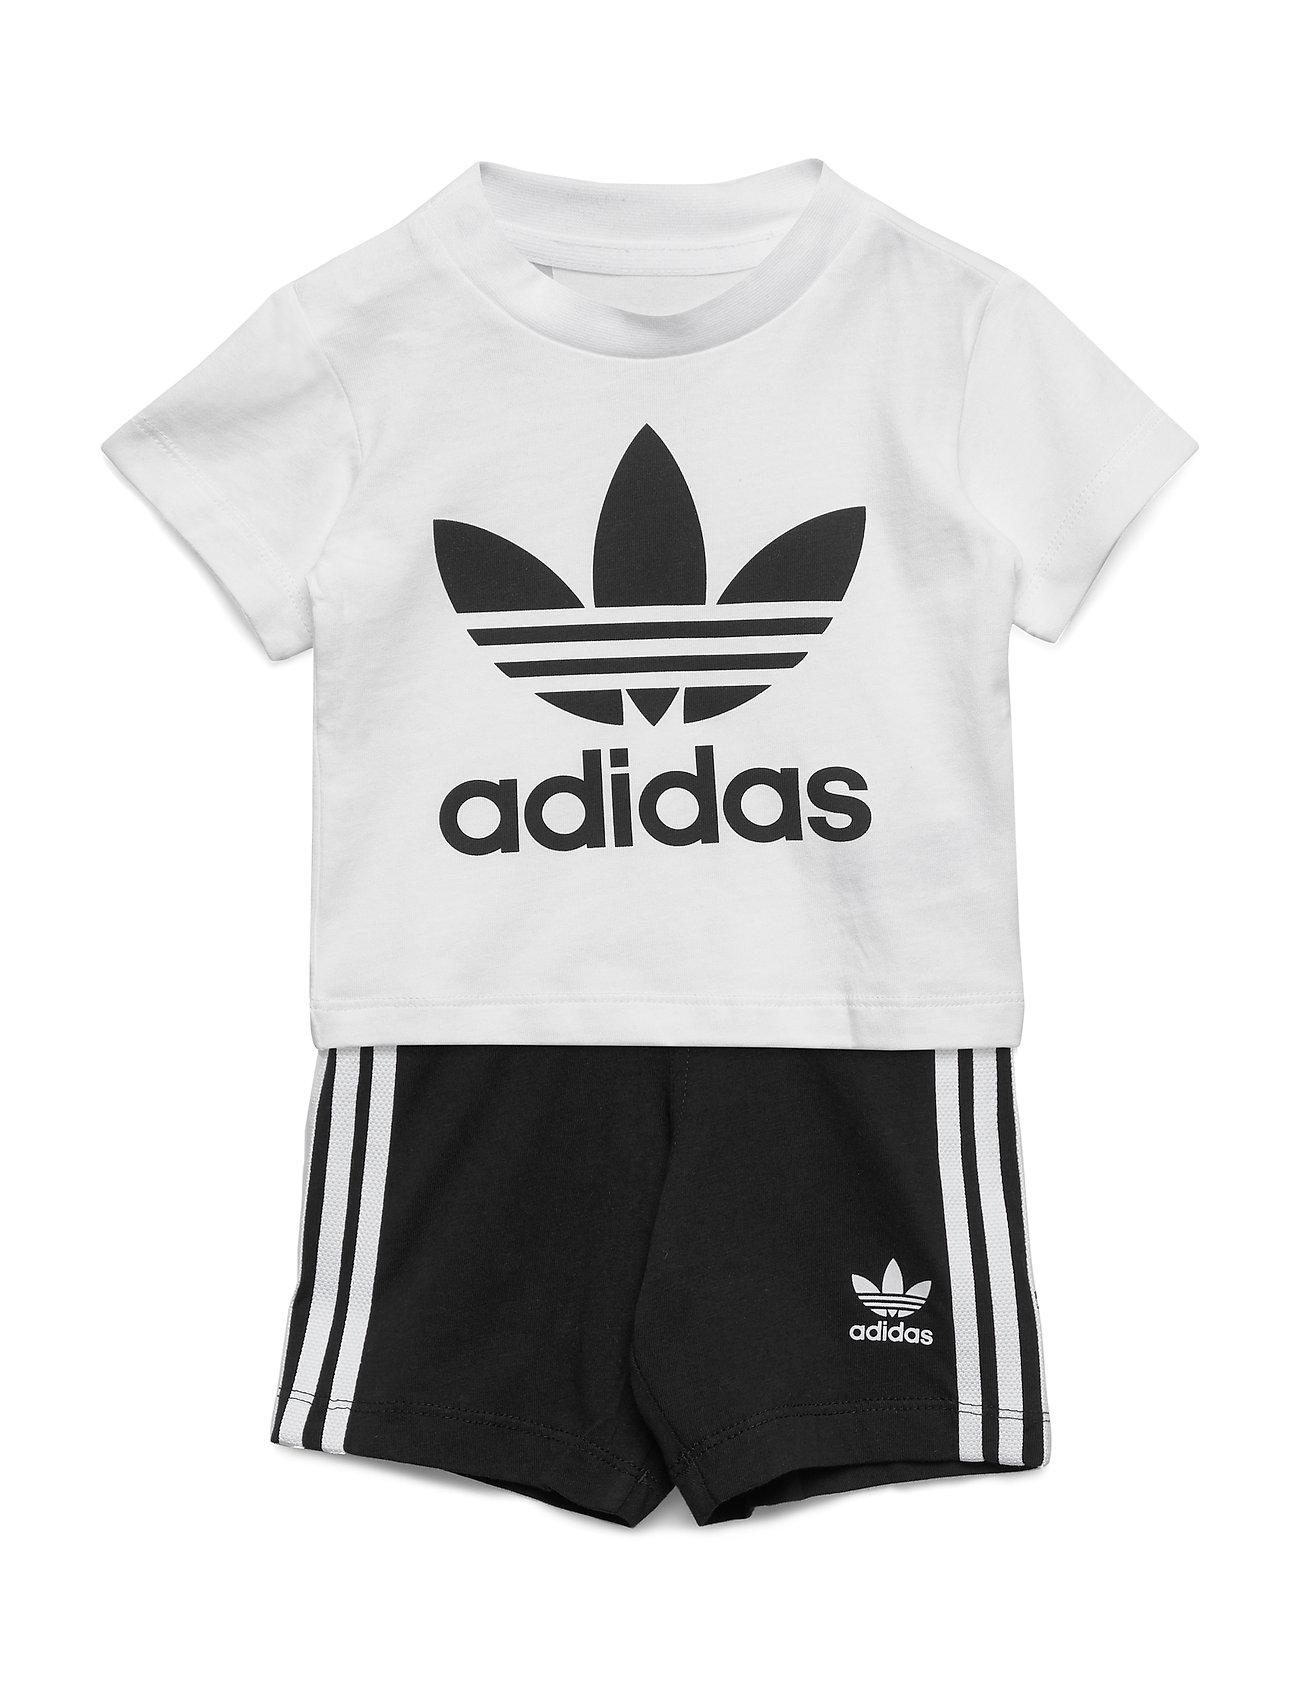 adidas Originals SHORT TEE SET - WHITE/BLACK